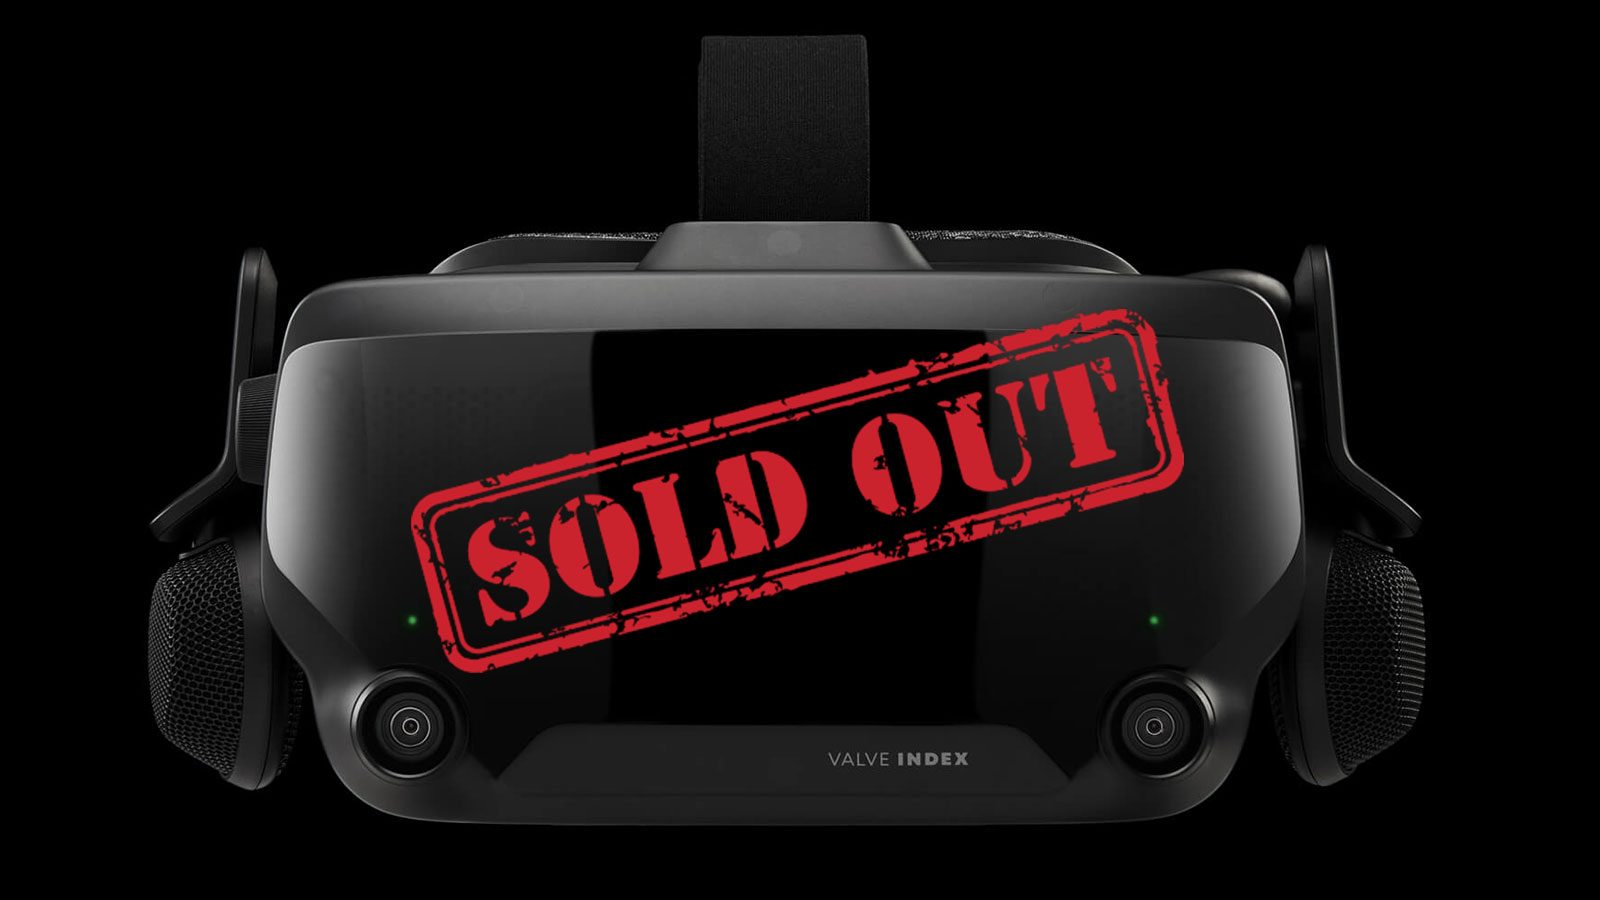 Valve Index Coronavirus Valve sold out